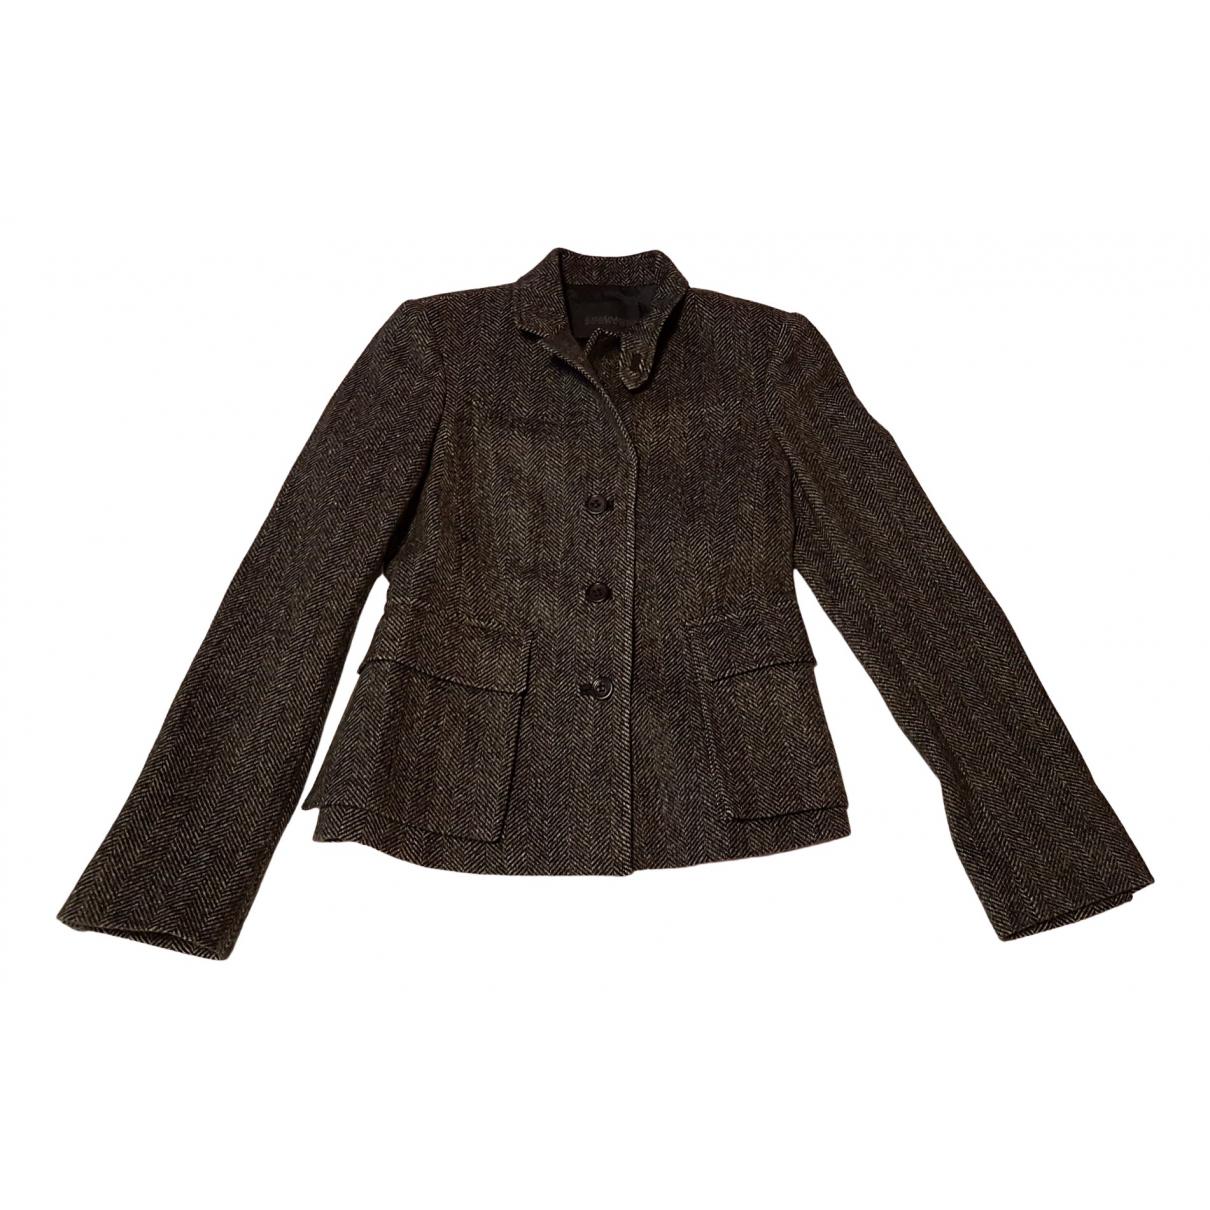 Ermanno Scervino \N Multicolour Wool jacket for Women 42 IT